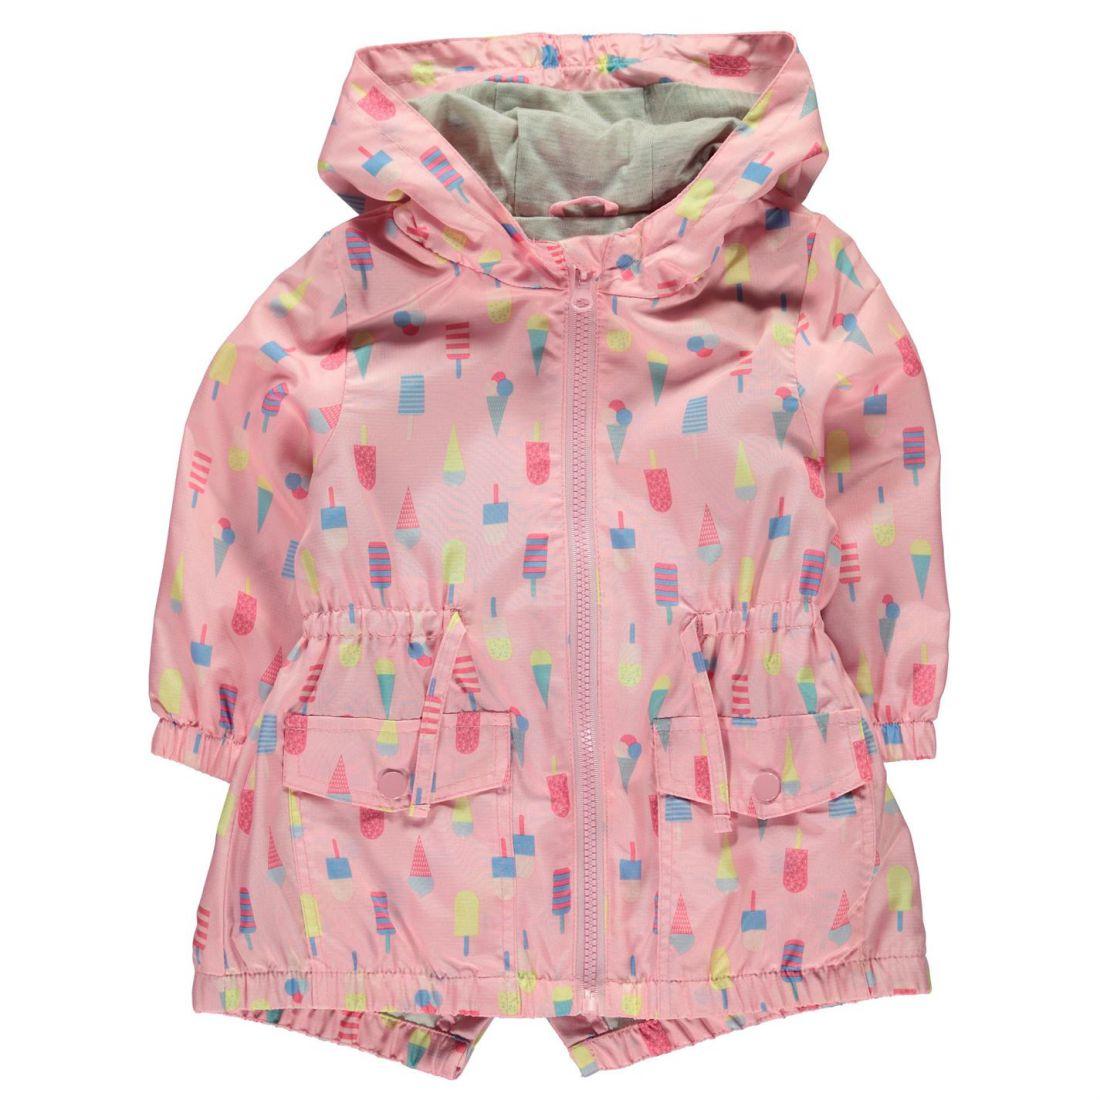 5e53f556e Crafted Kids Girls Rain Mac Child Jacket Coat Top Lightweight Hooded ...